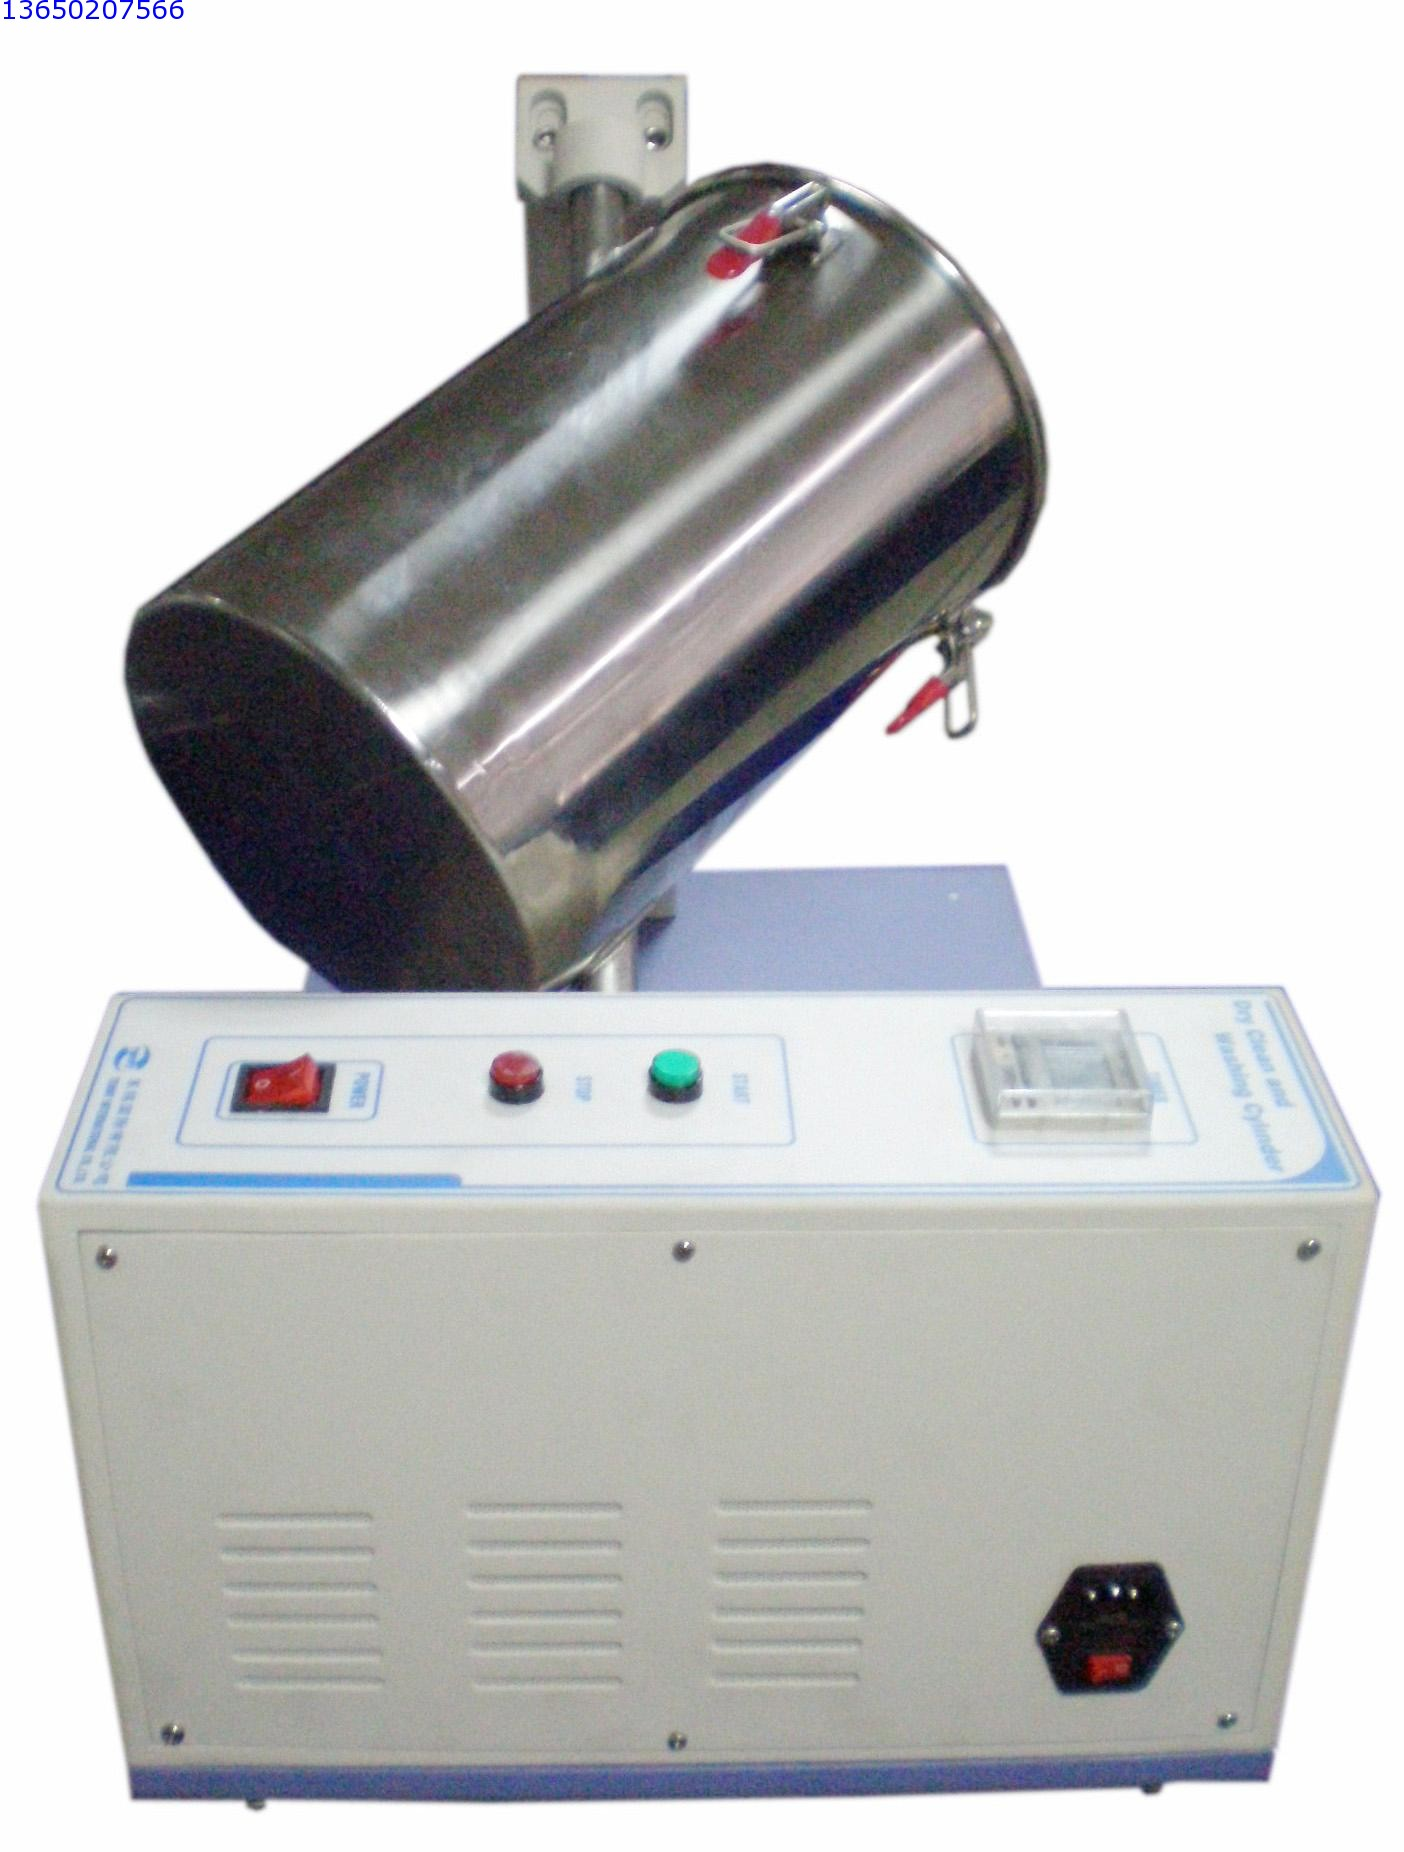 QI-S-026干洗机